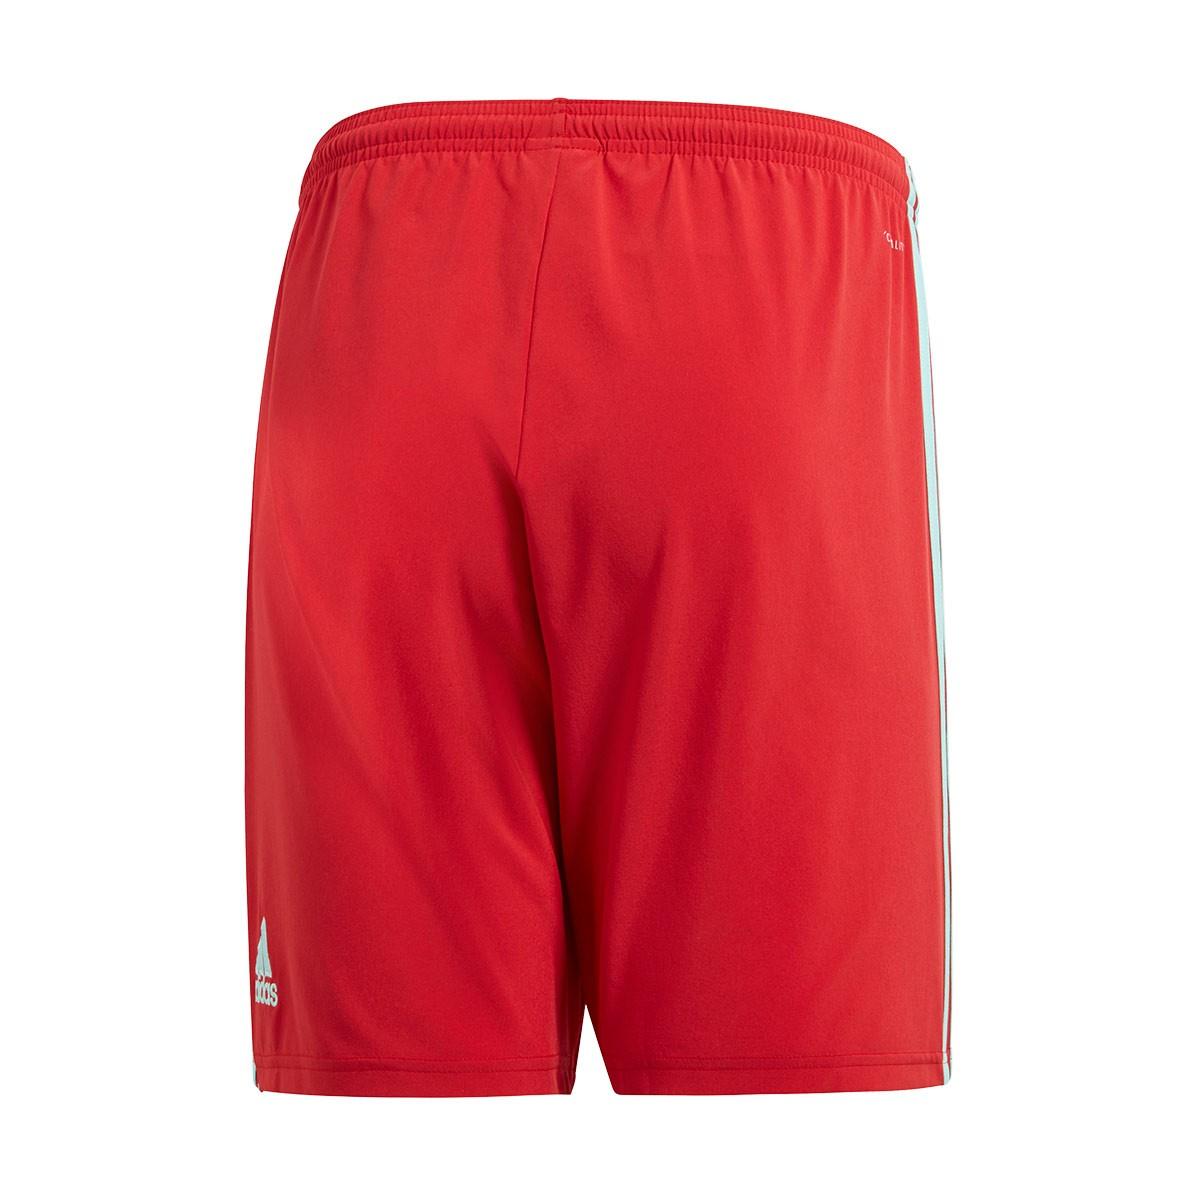 Pantalón corto Condivo 18 Power red Energy aqua